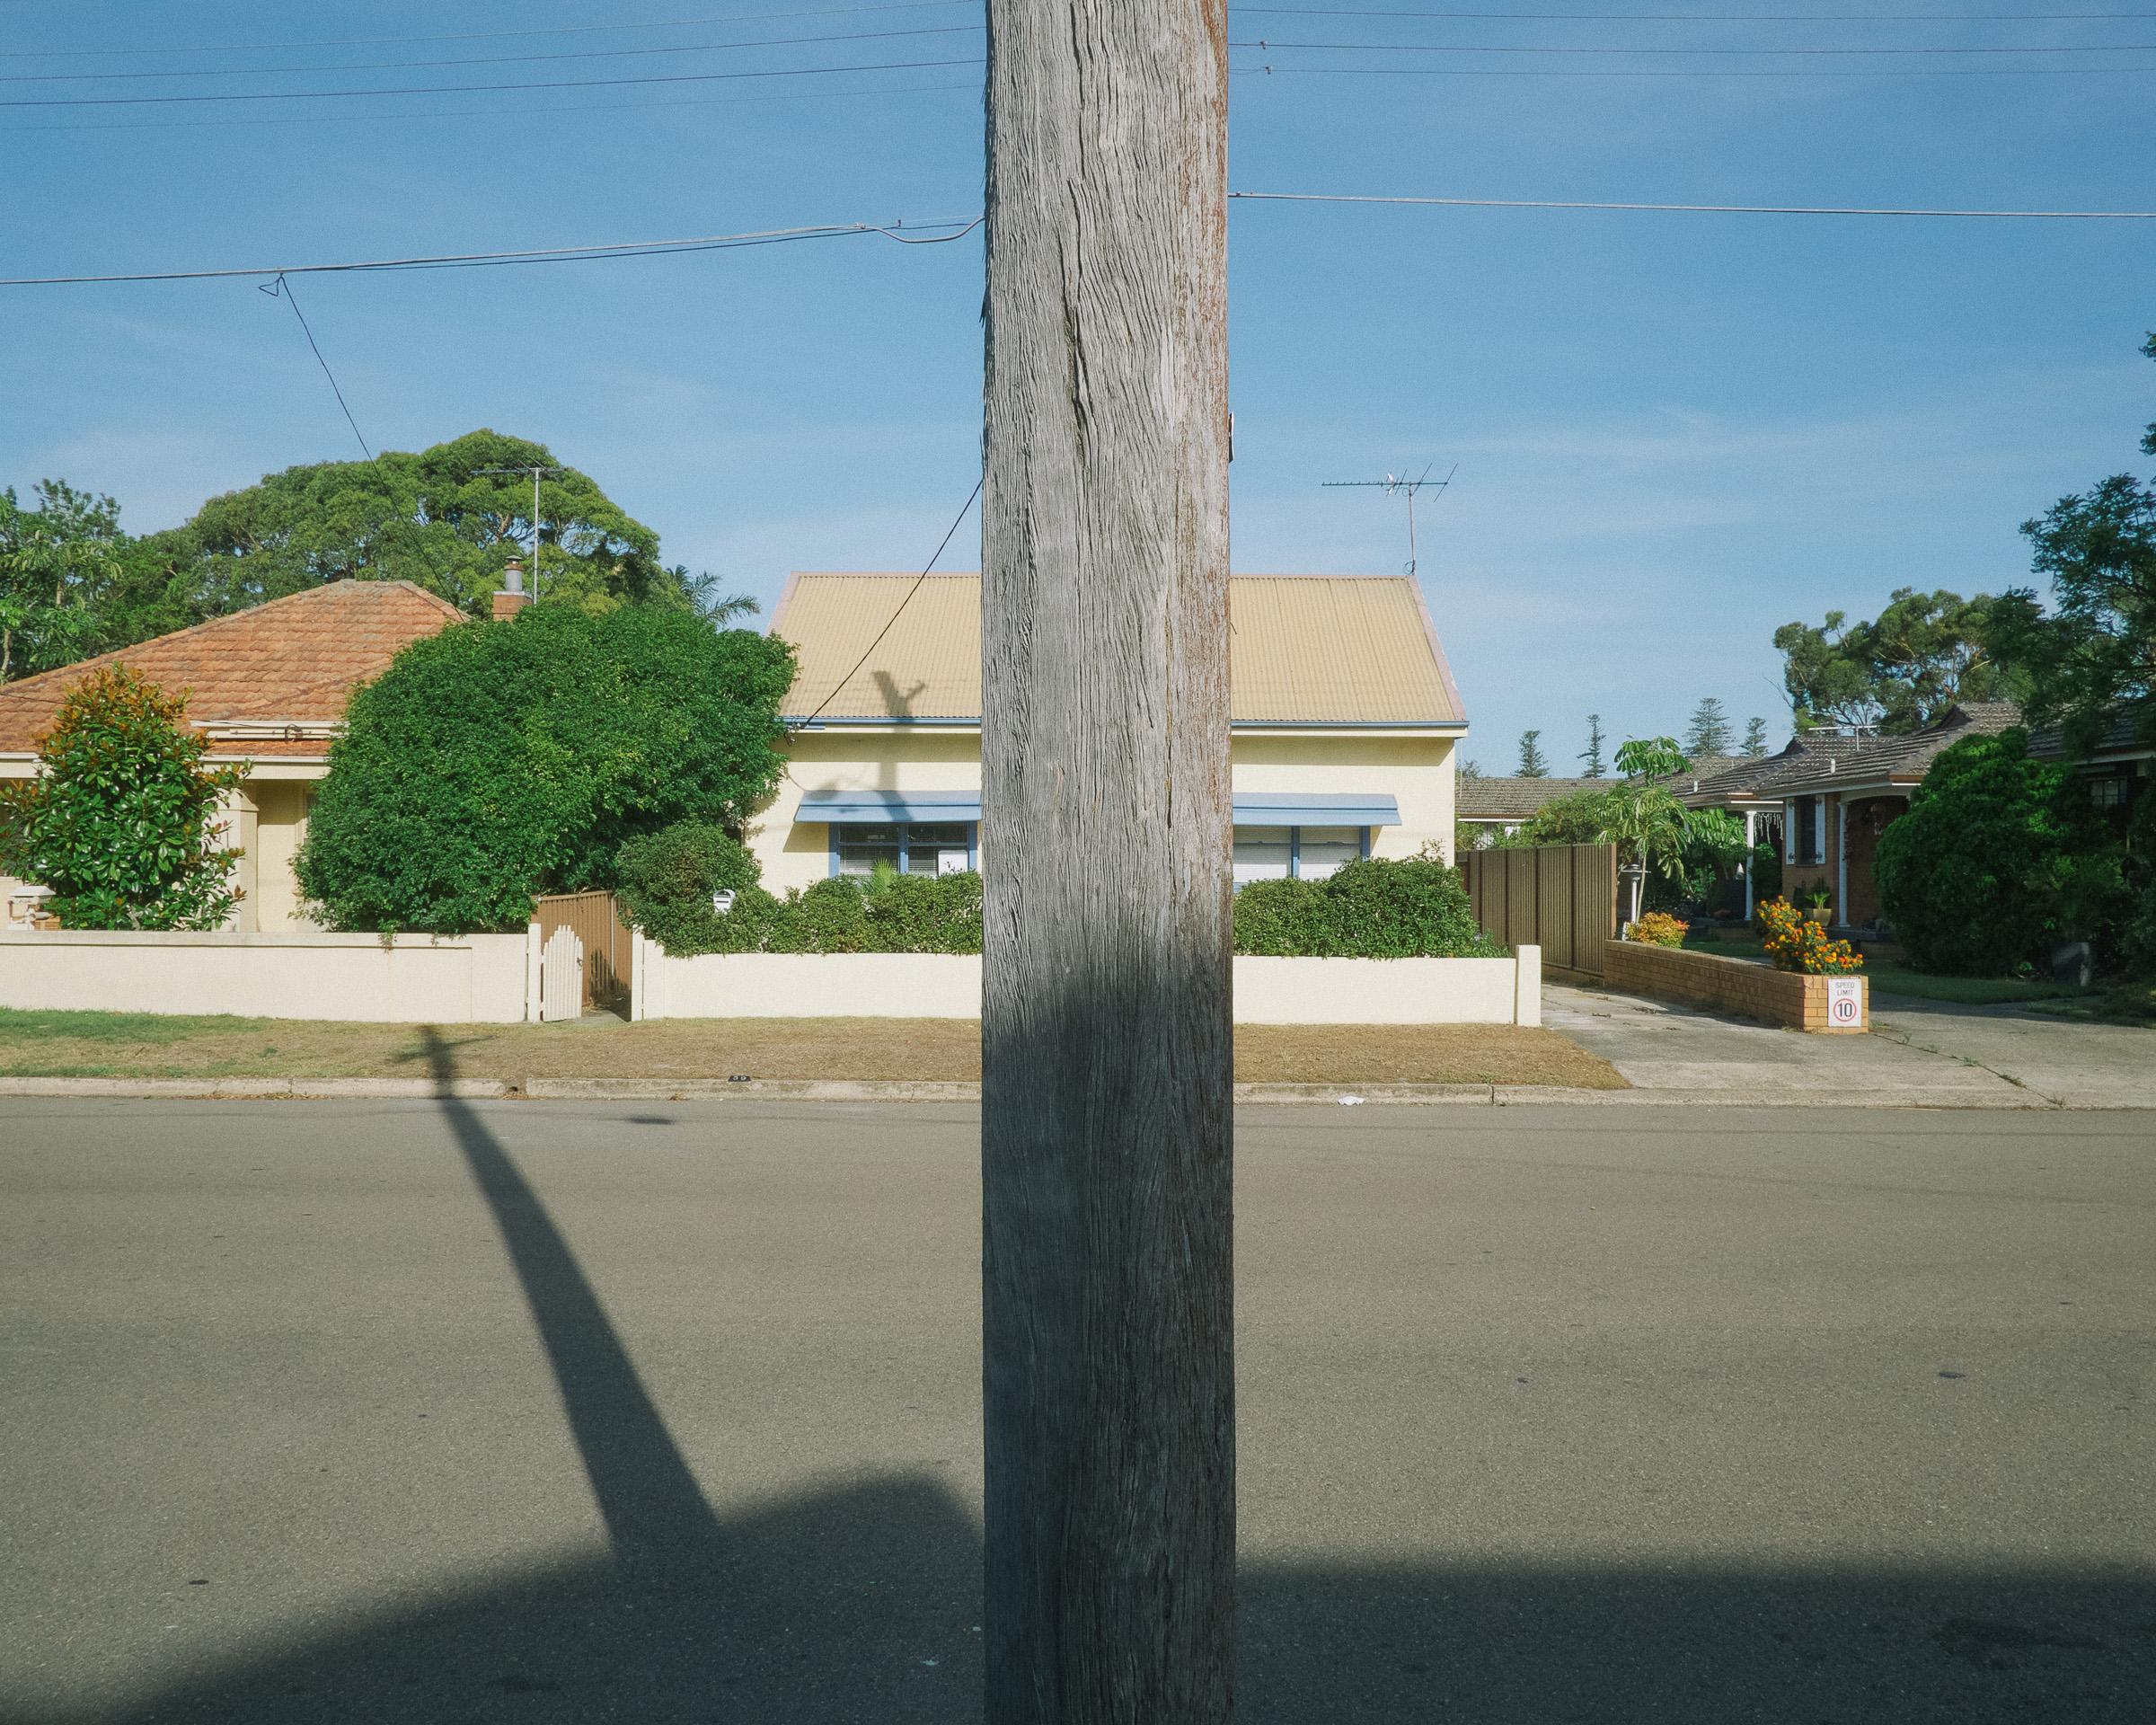 ids_suburbia-01-1.jpg